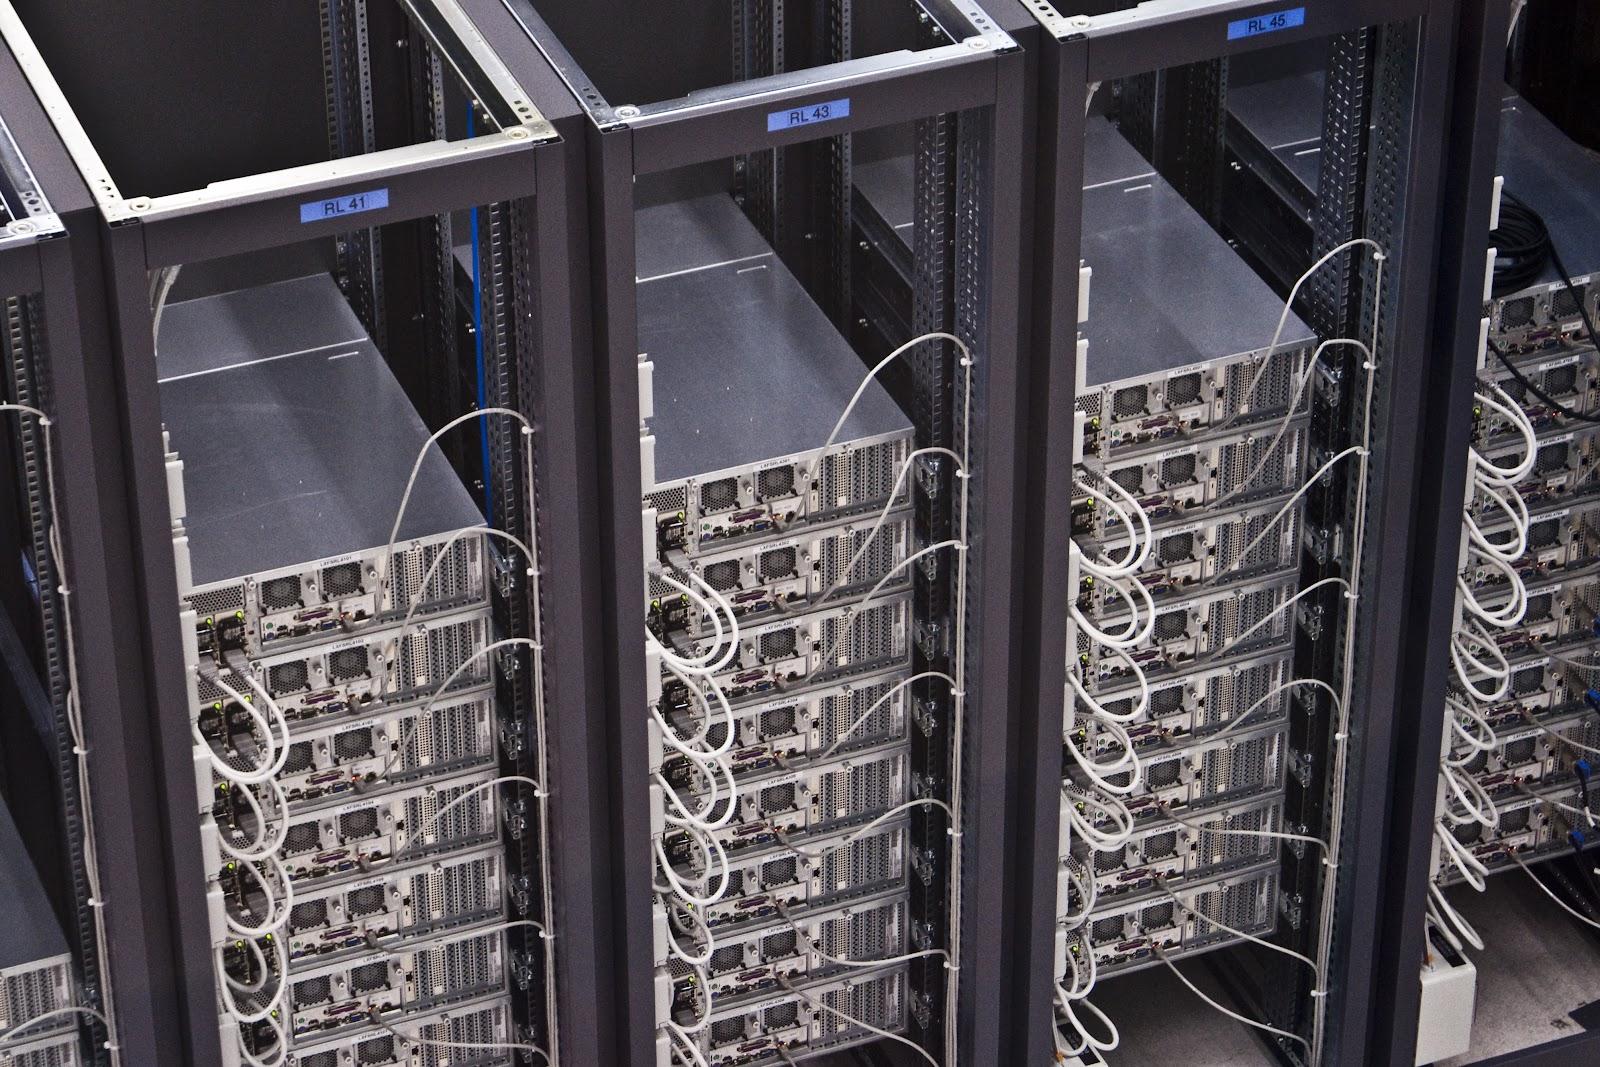 File:CERN Server.jpg